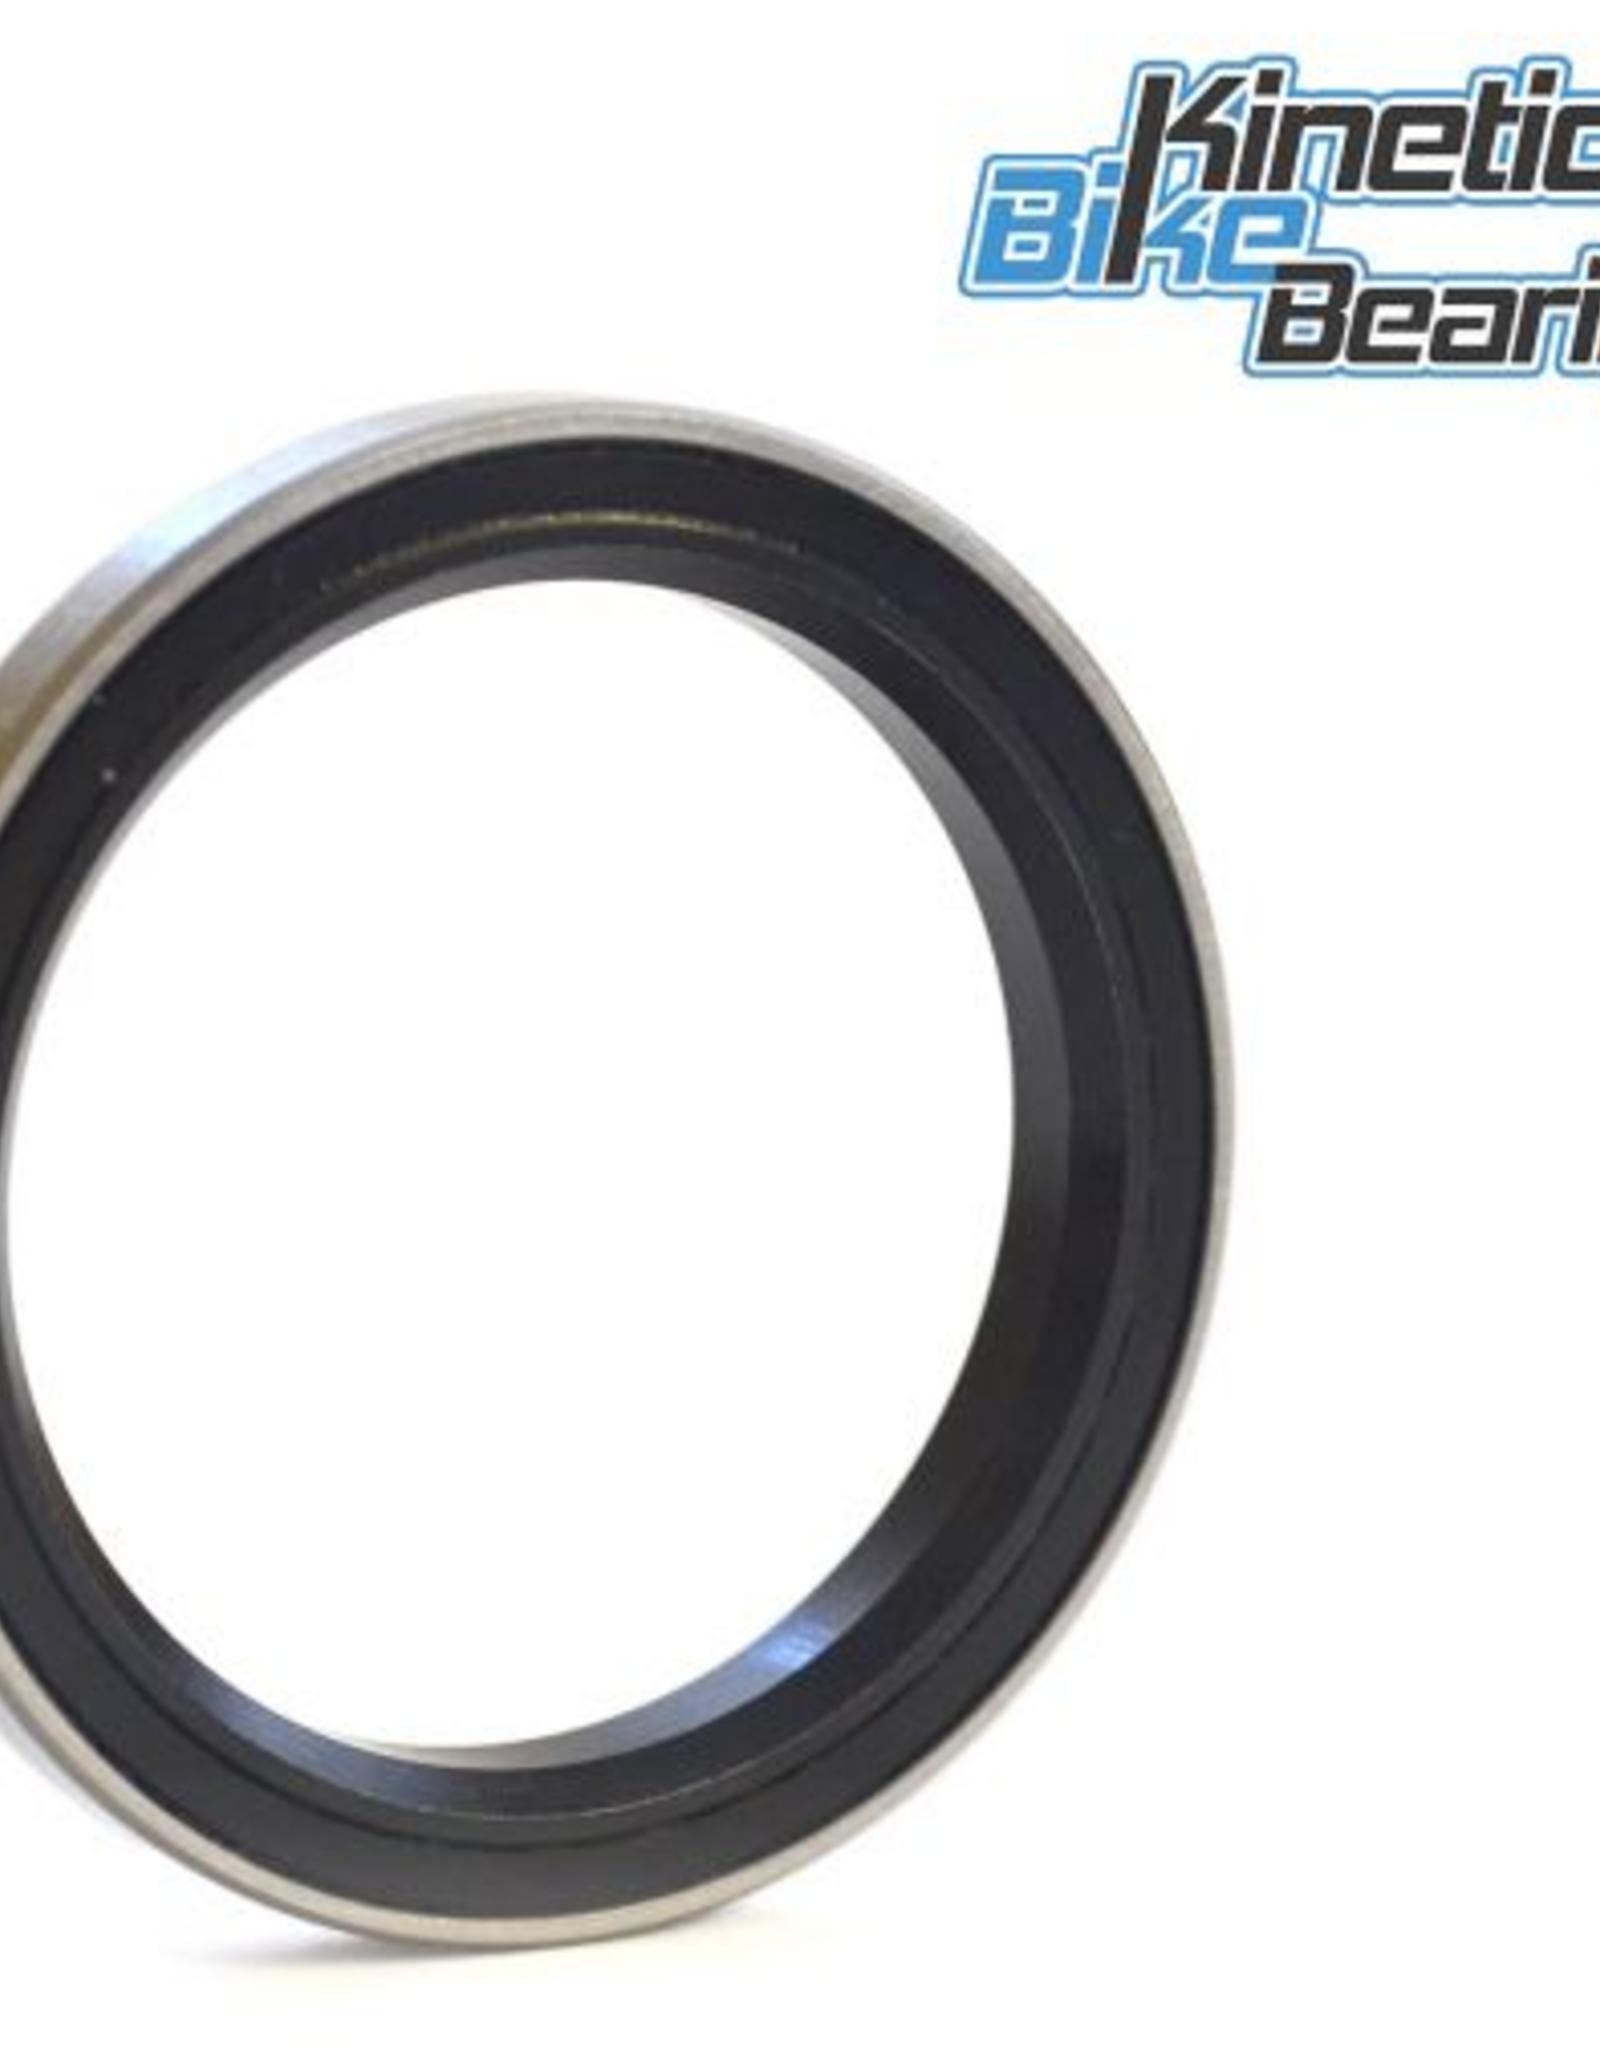 Kinetic Headset Bearing P21 37 x 49 x 7mm